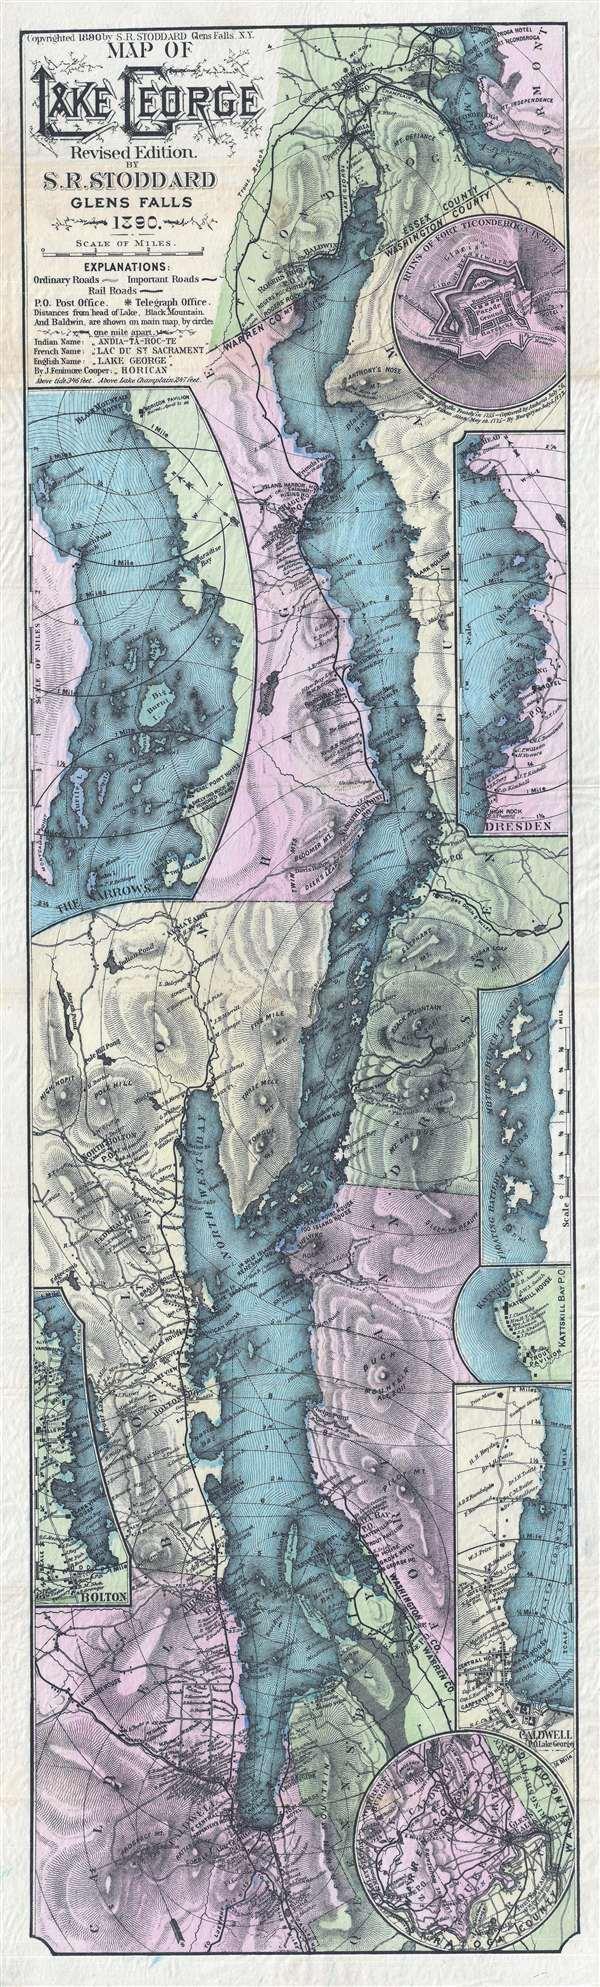 Map of Lake George.